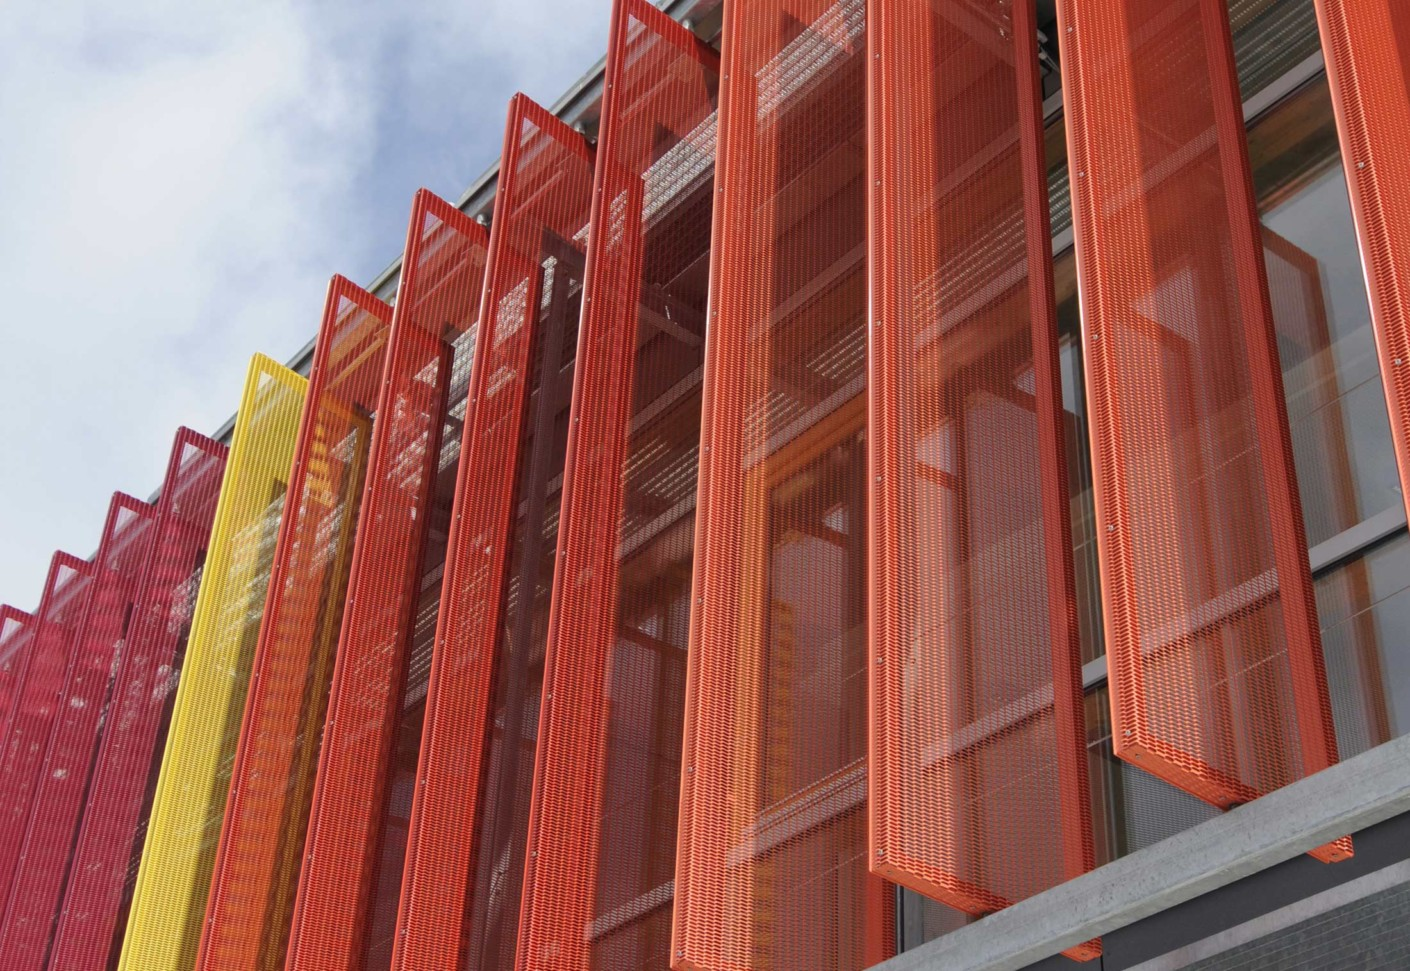 Front Elevation Of College Building : Verstellbare vertikale großlamellenfassade von colt